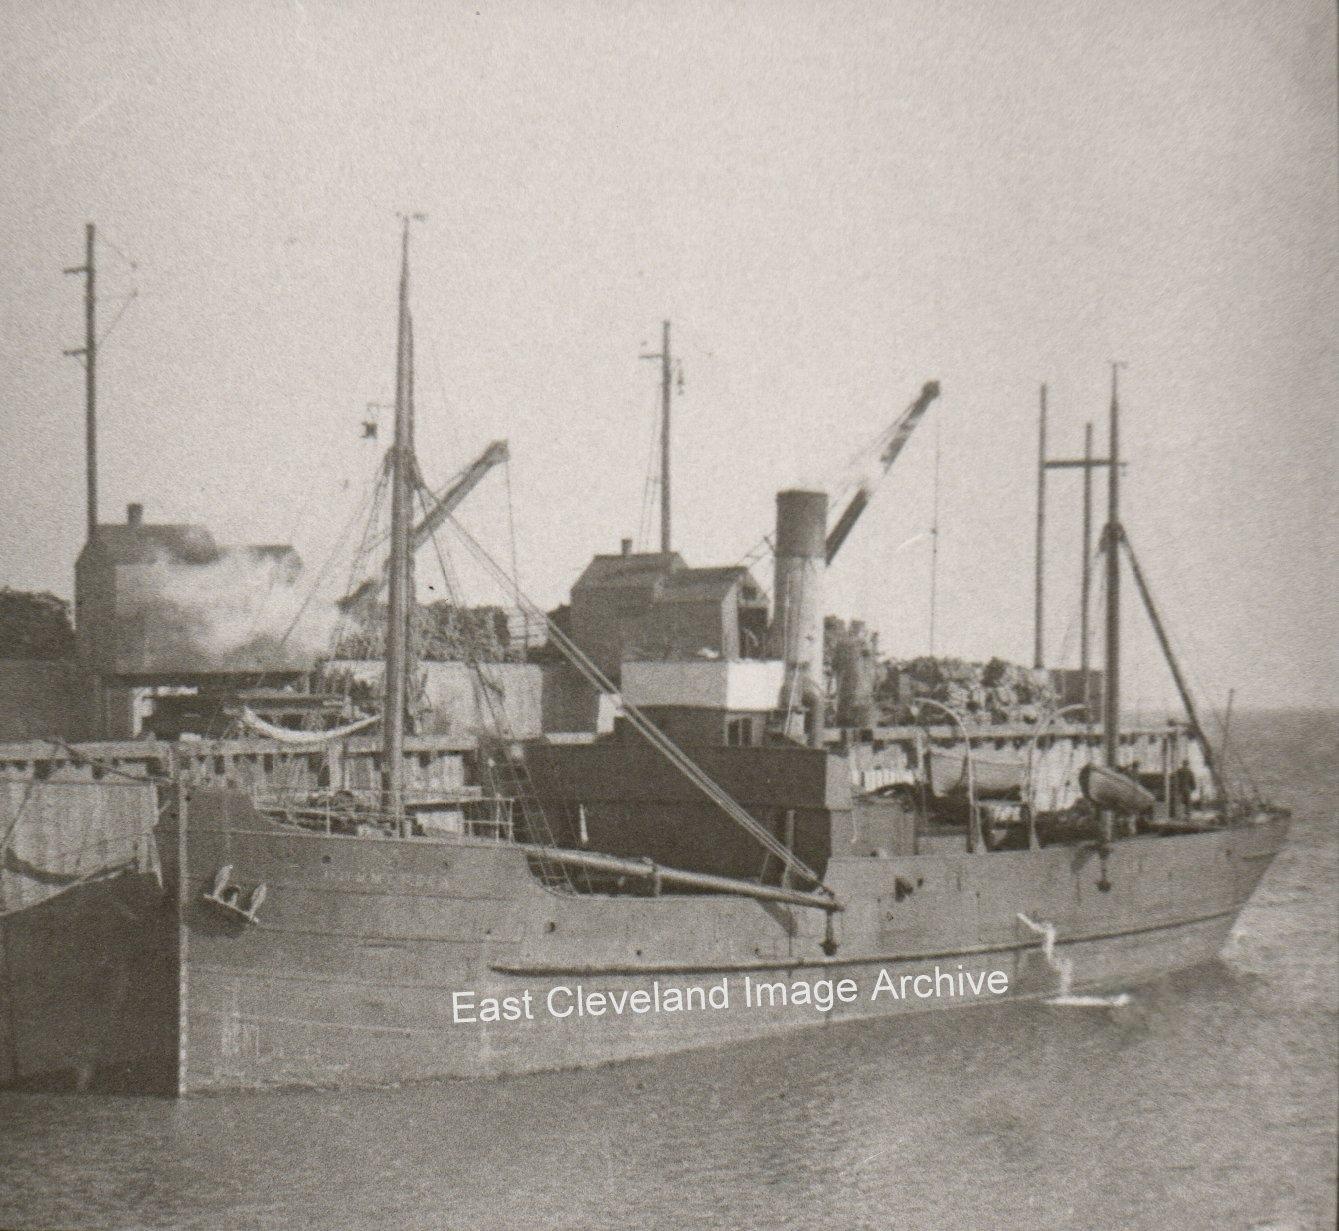 SS Hummersea